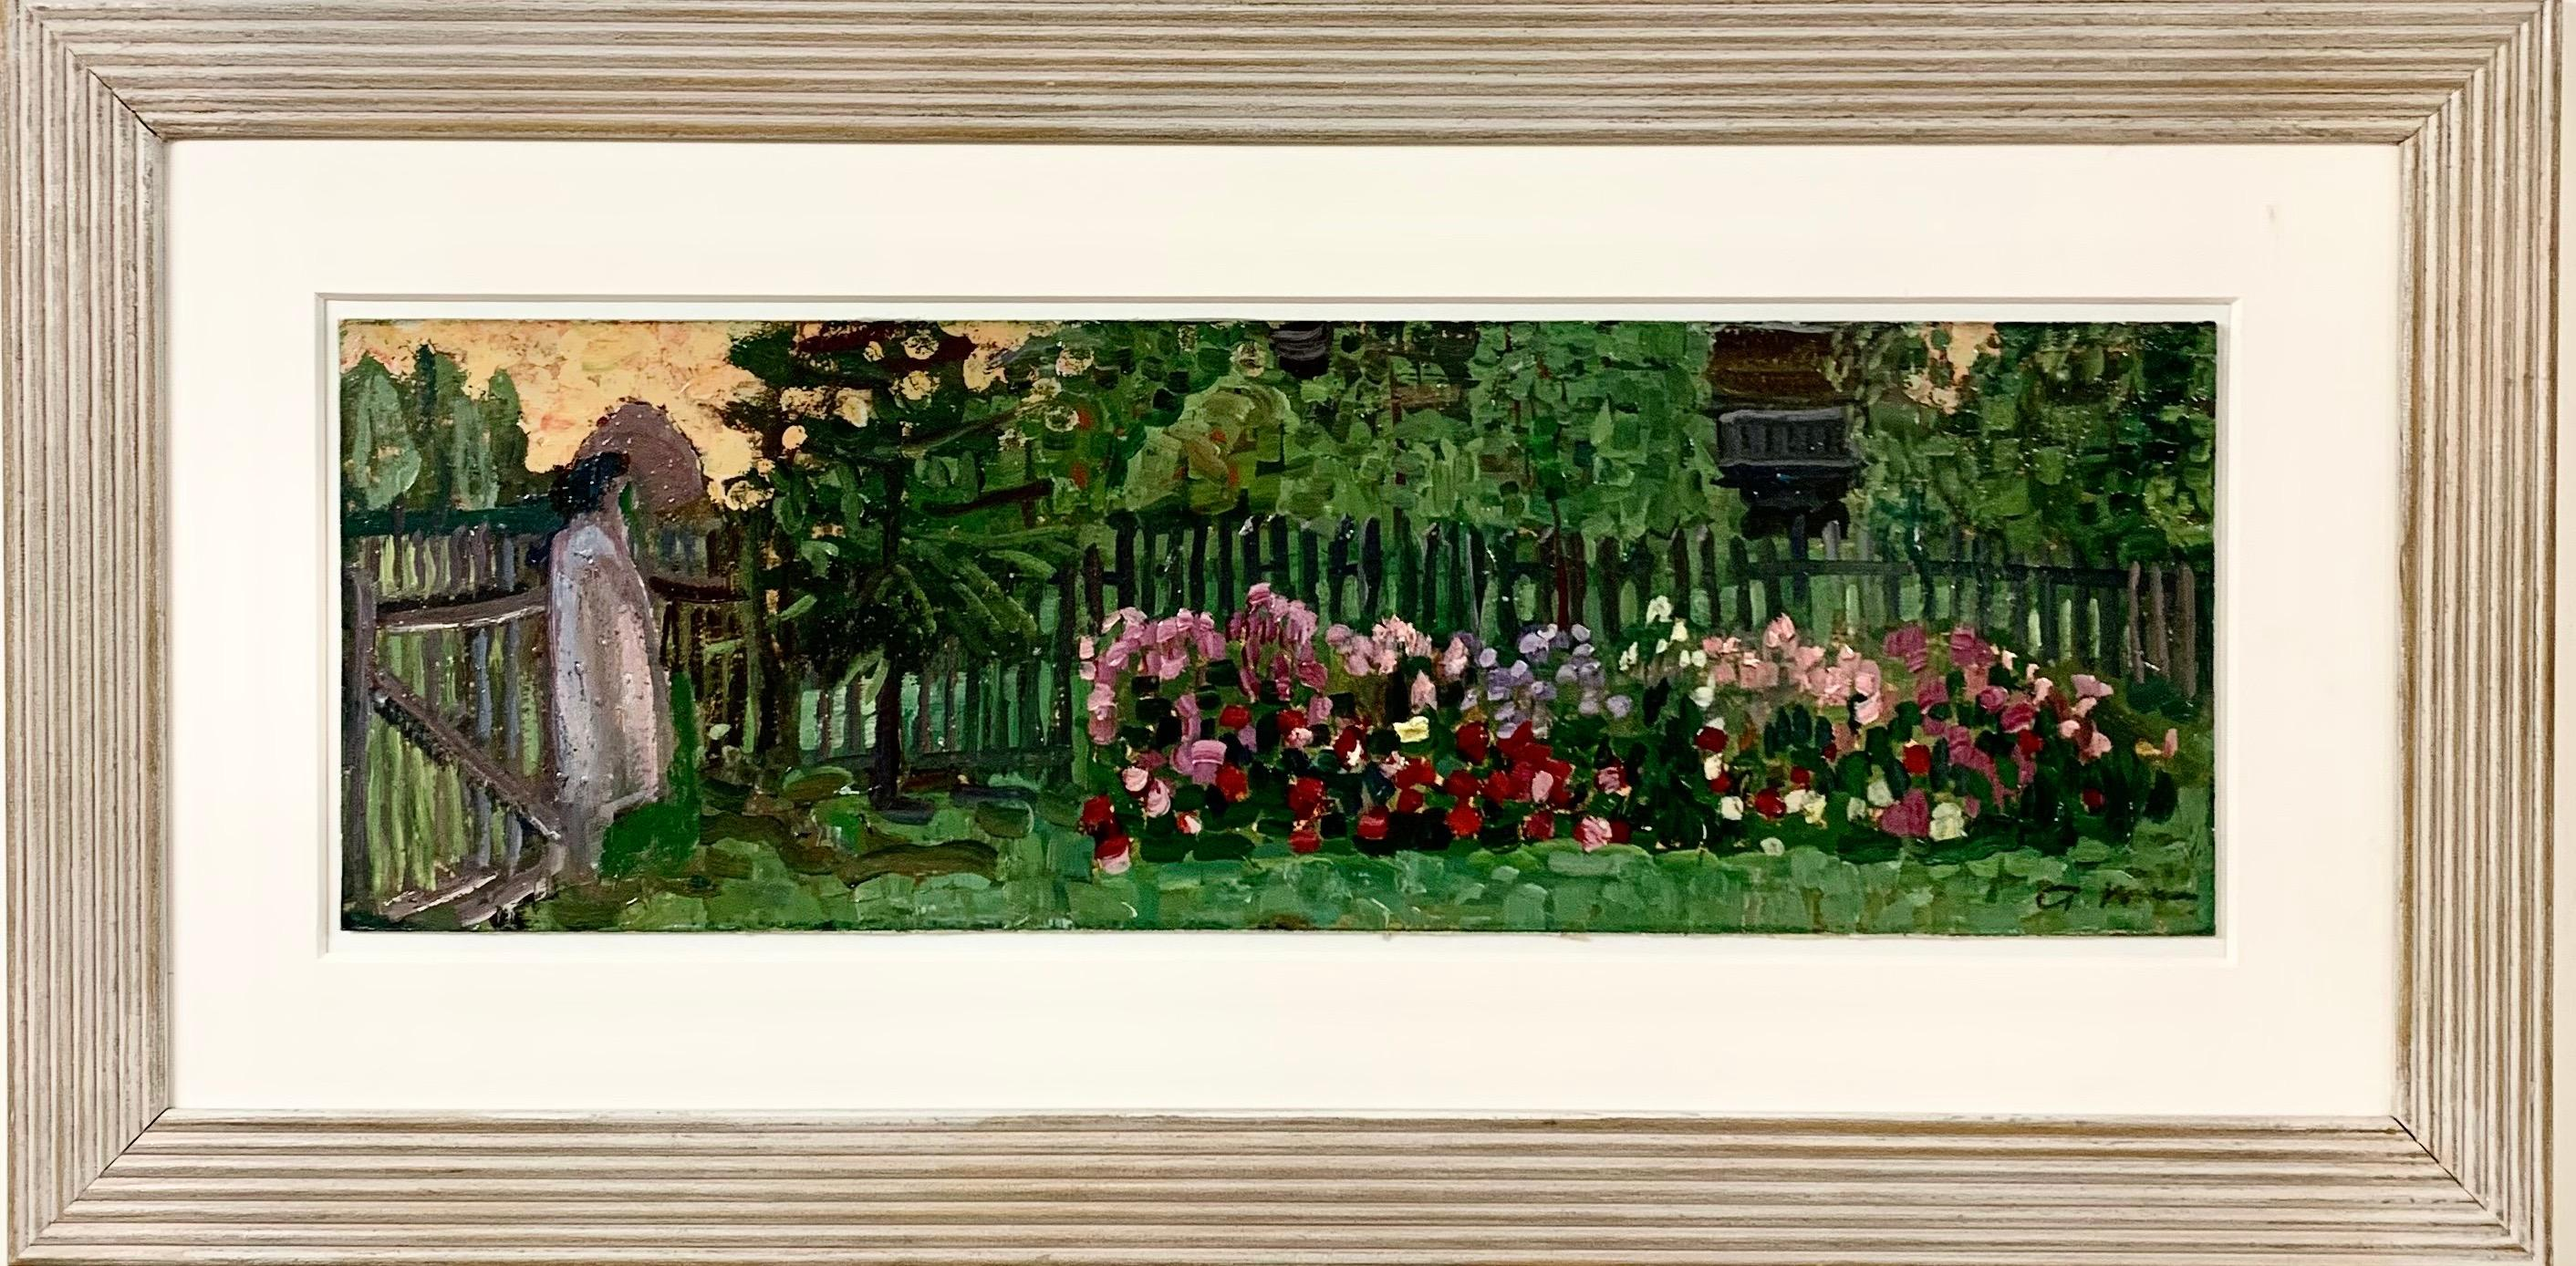 """Flowers in my garden"" Garden, flowers, sunset, Oilcm. 51 x 17"